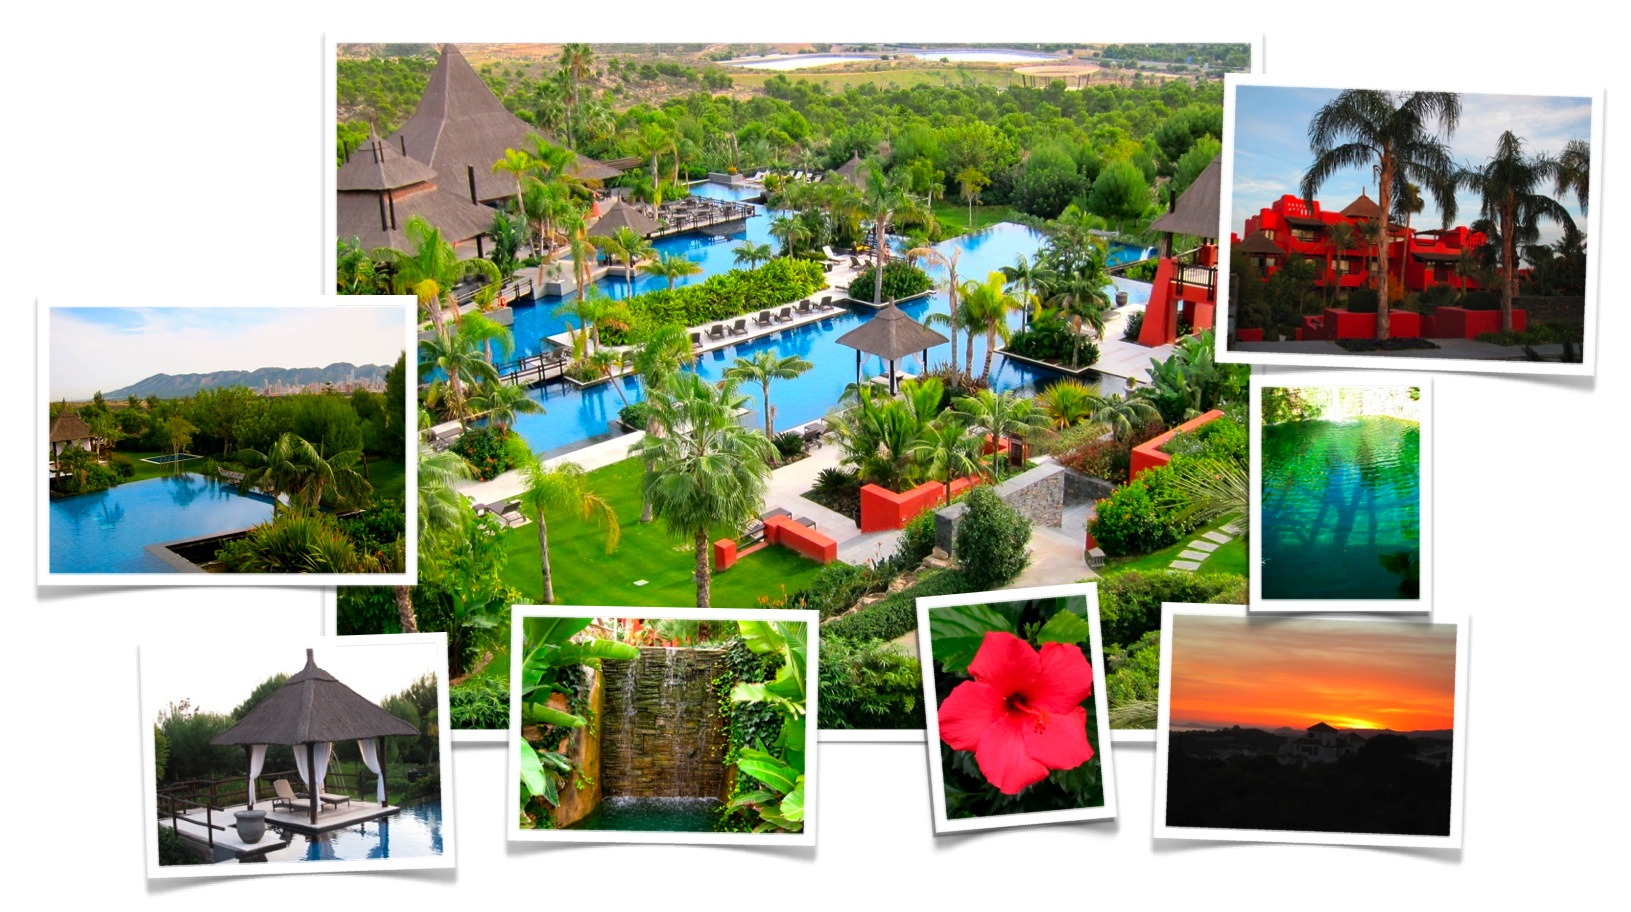 ¿¿¿Os apetecería viajar a Thailandia sin necesidad de salir de España???